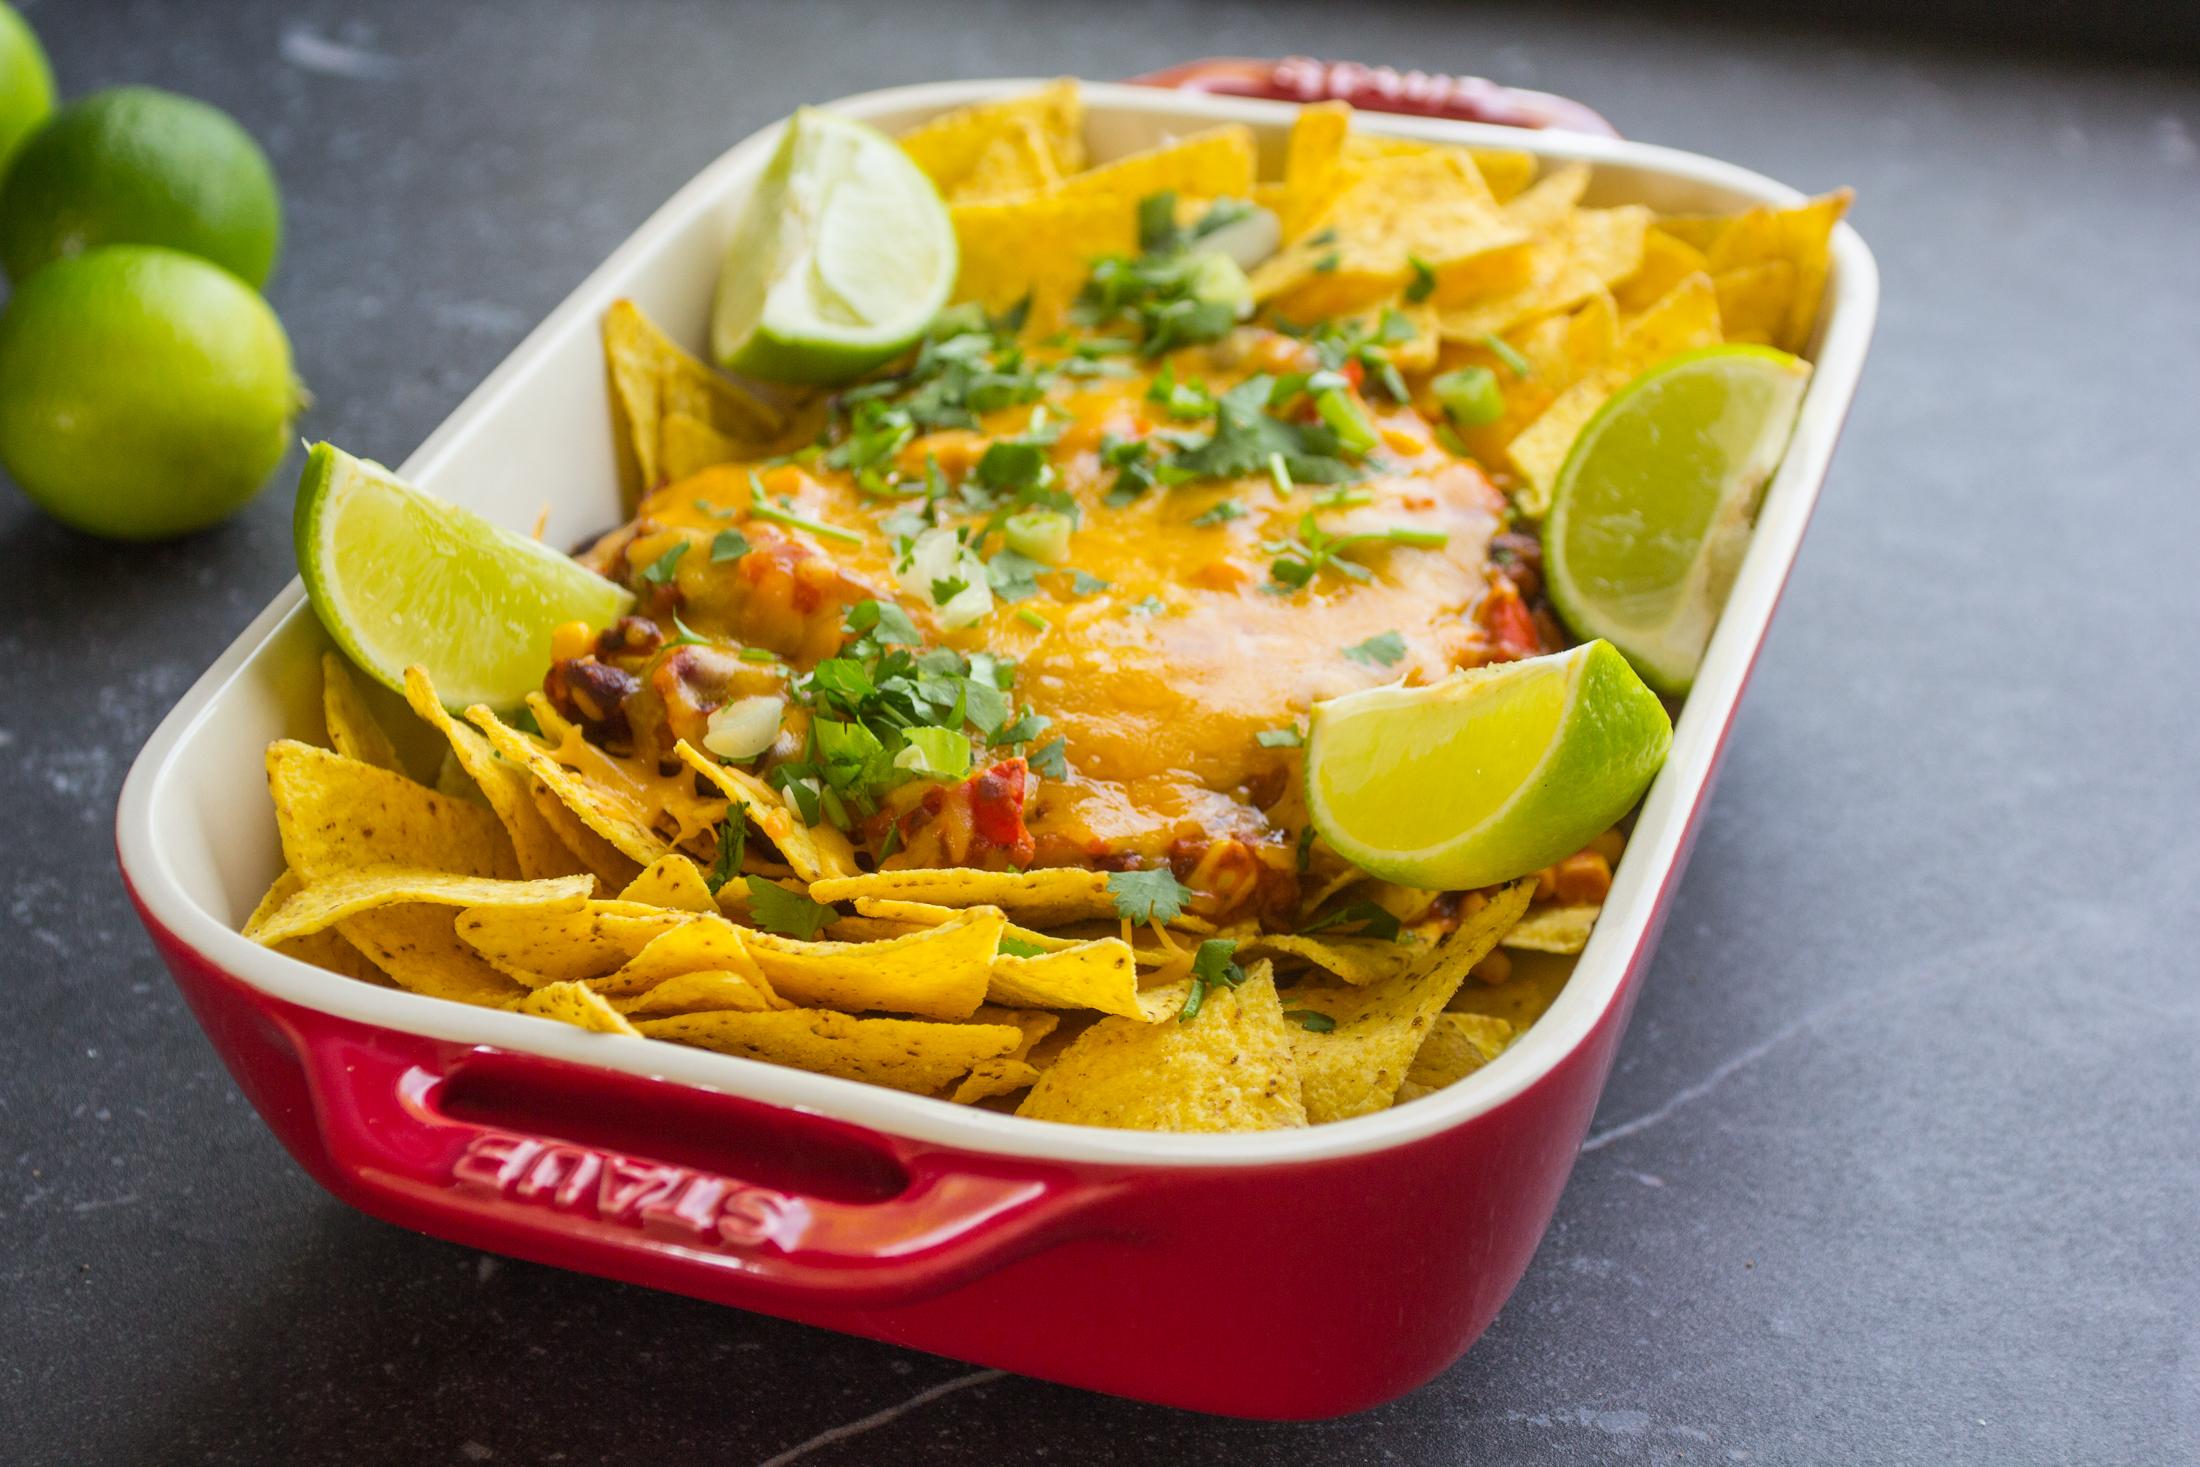 Nacho's chili sin carne